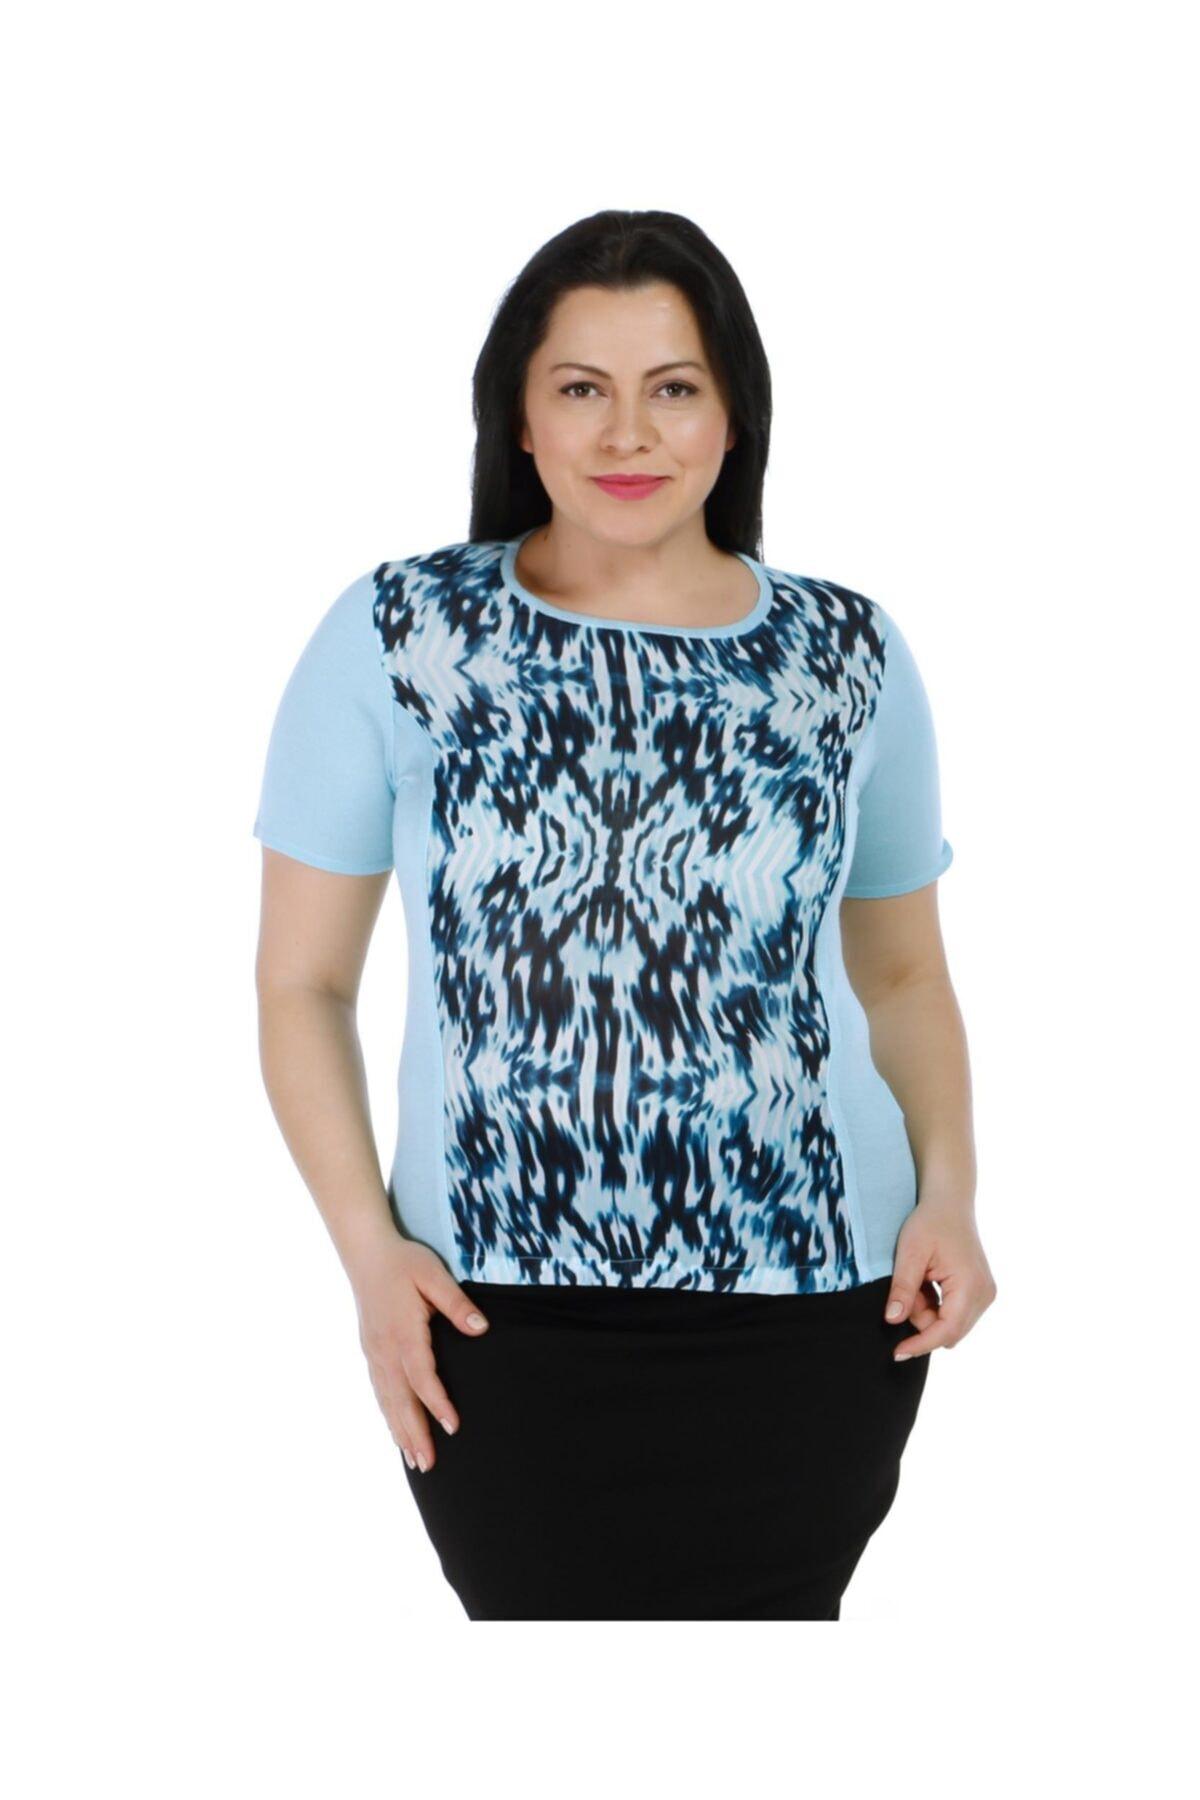 Solo Dalgalı Desenli Bluz 1